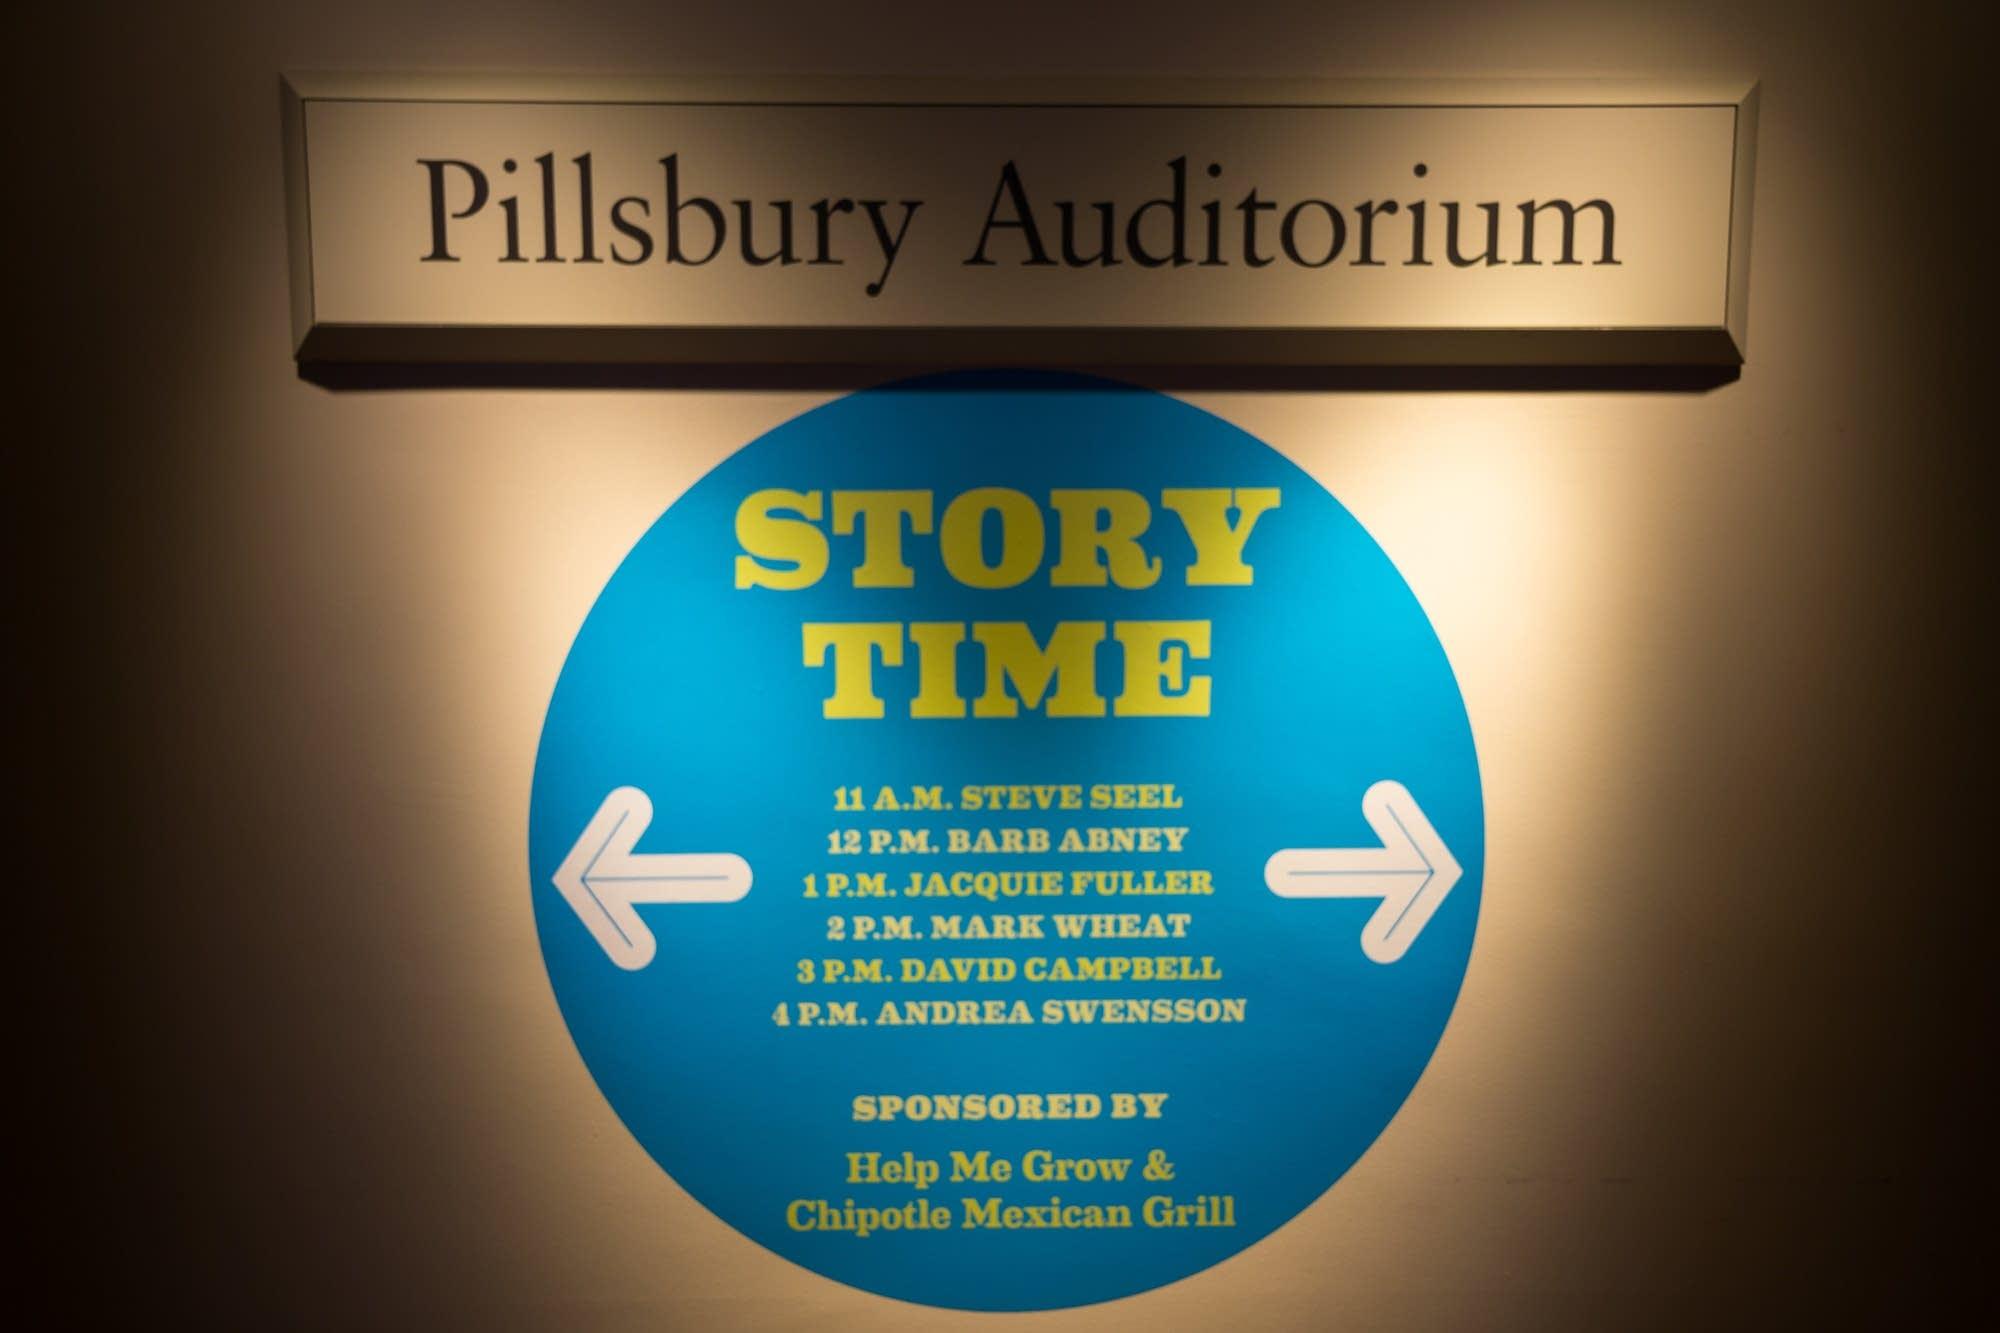 Pillsbury Auditorium